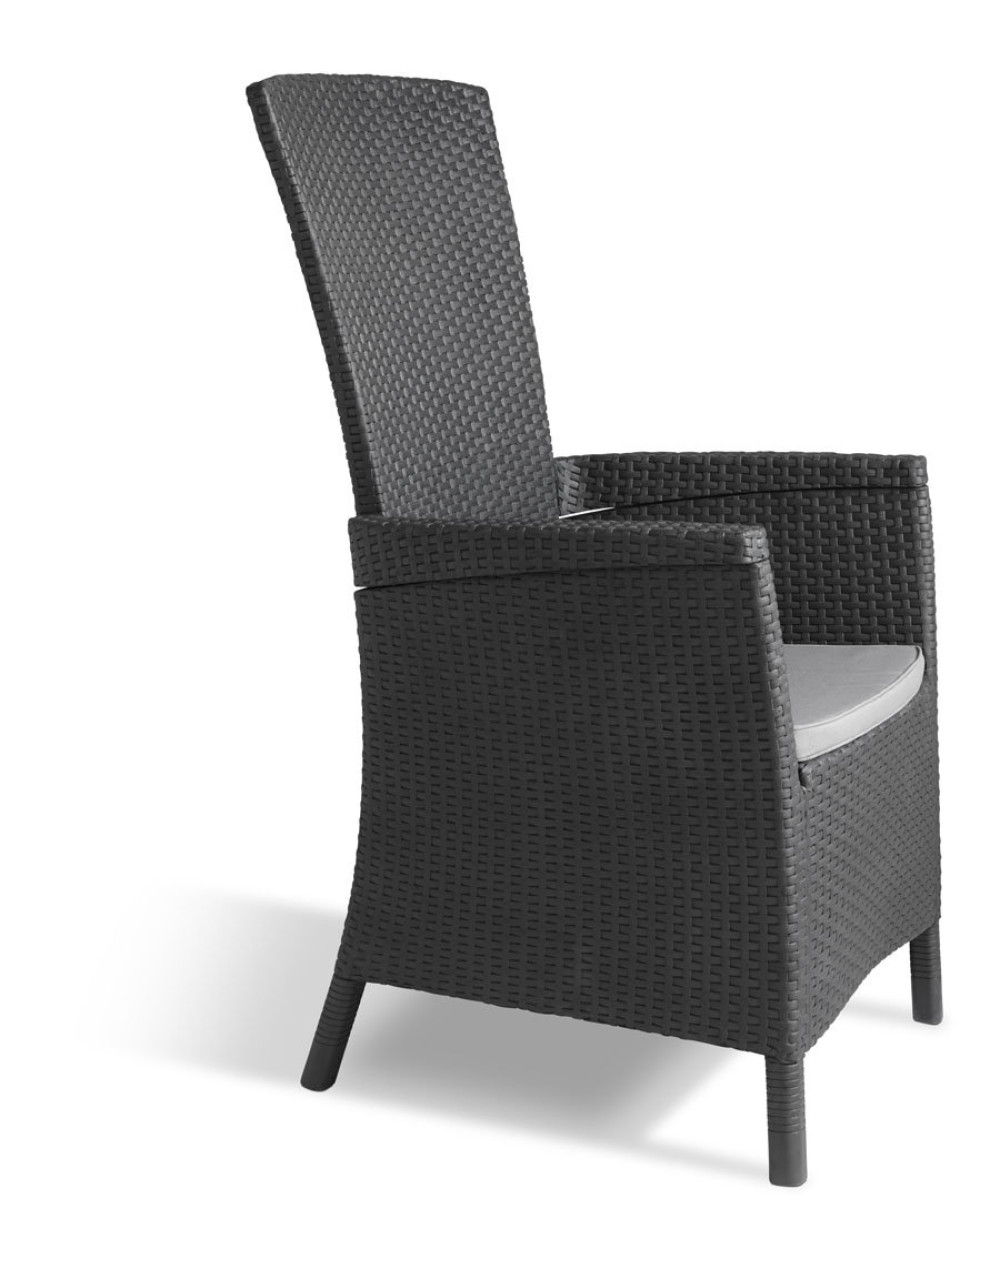 polyrattan stuhl verstellbar simple polyrattan stuhl sthle rattan gartensthle sessel braun with. Black Bedroom Furniture Sets. Home Design Ideas